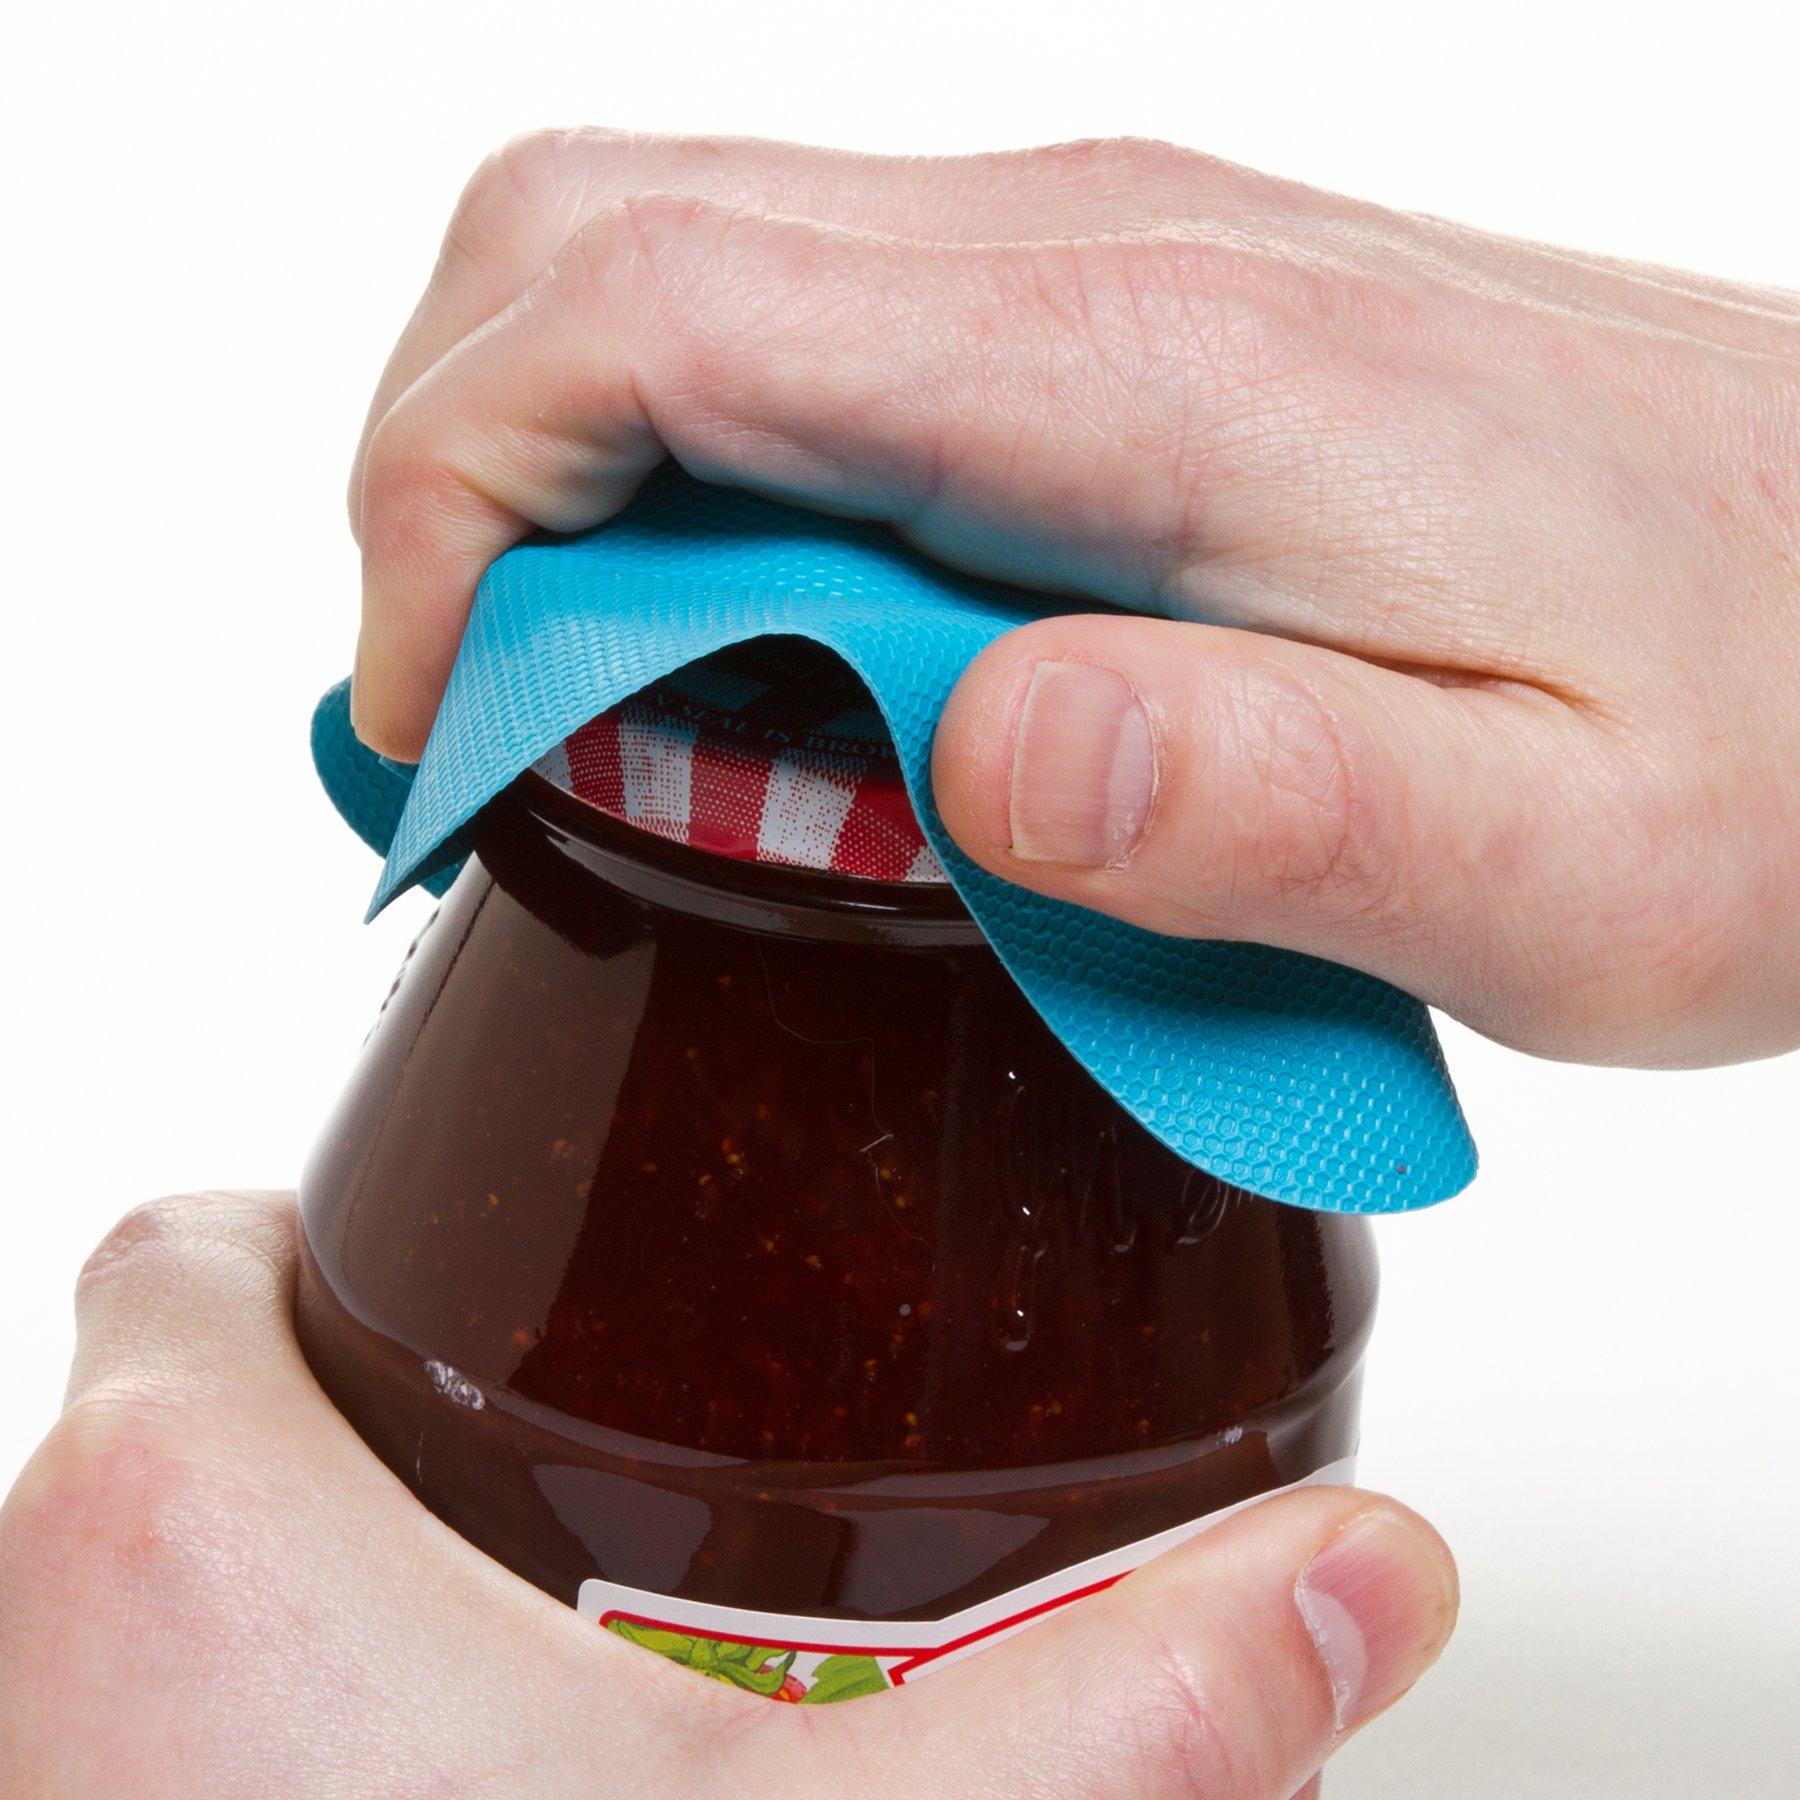 Prepworks by Progressive Jar Grips - Set of 3, GT-3236, Multi-Purpose, Bottle Openers, Jar Gripper, Lid Opener